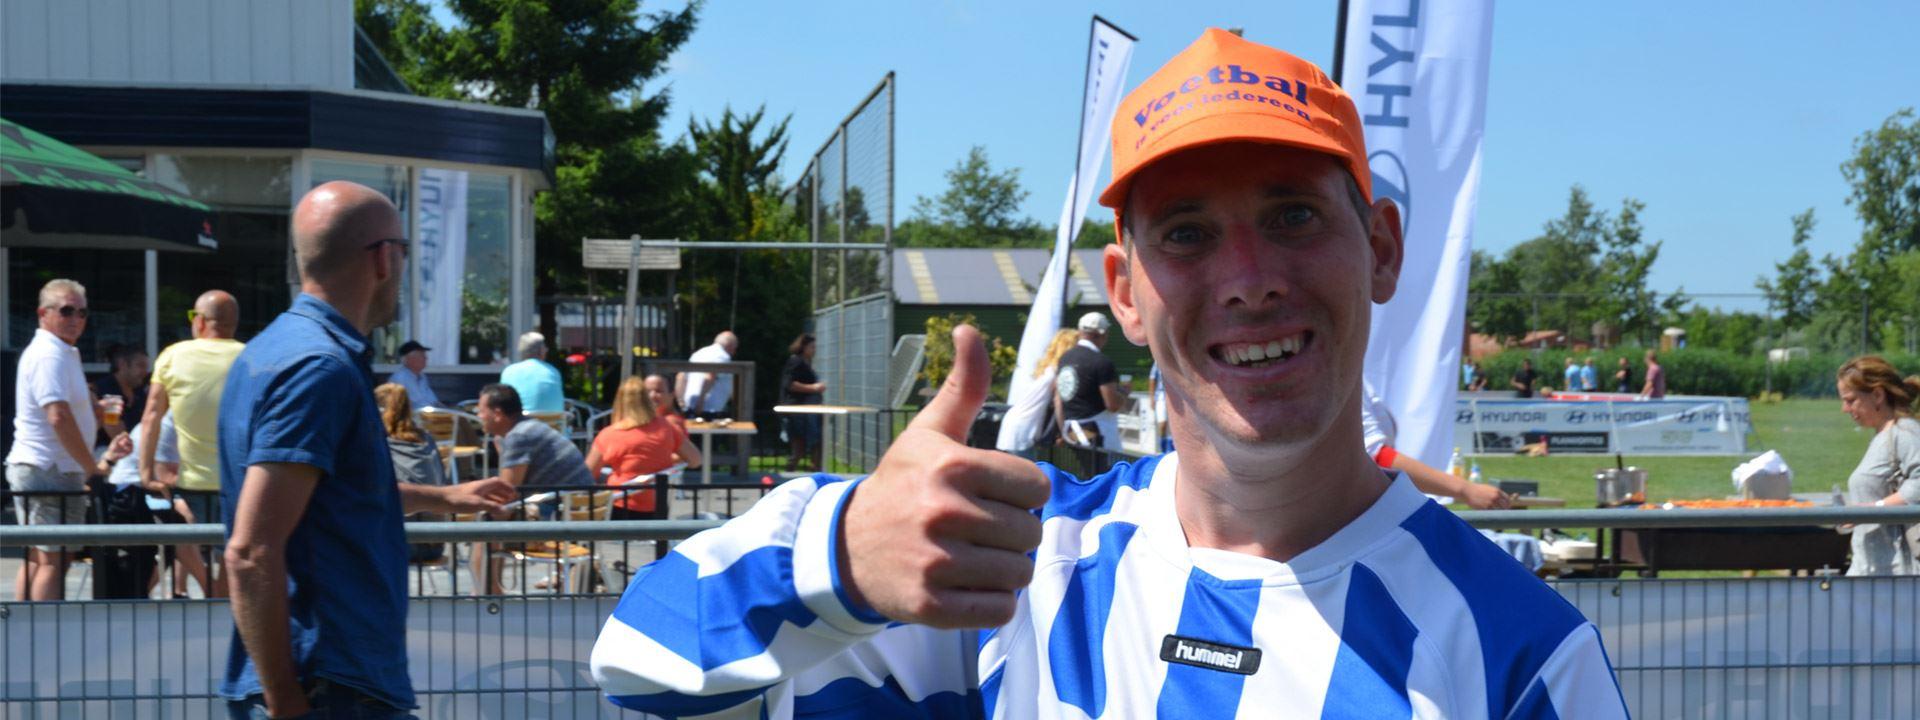 Hyundai helpt G voetballers hun dromen waar te maken